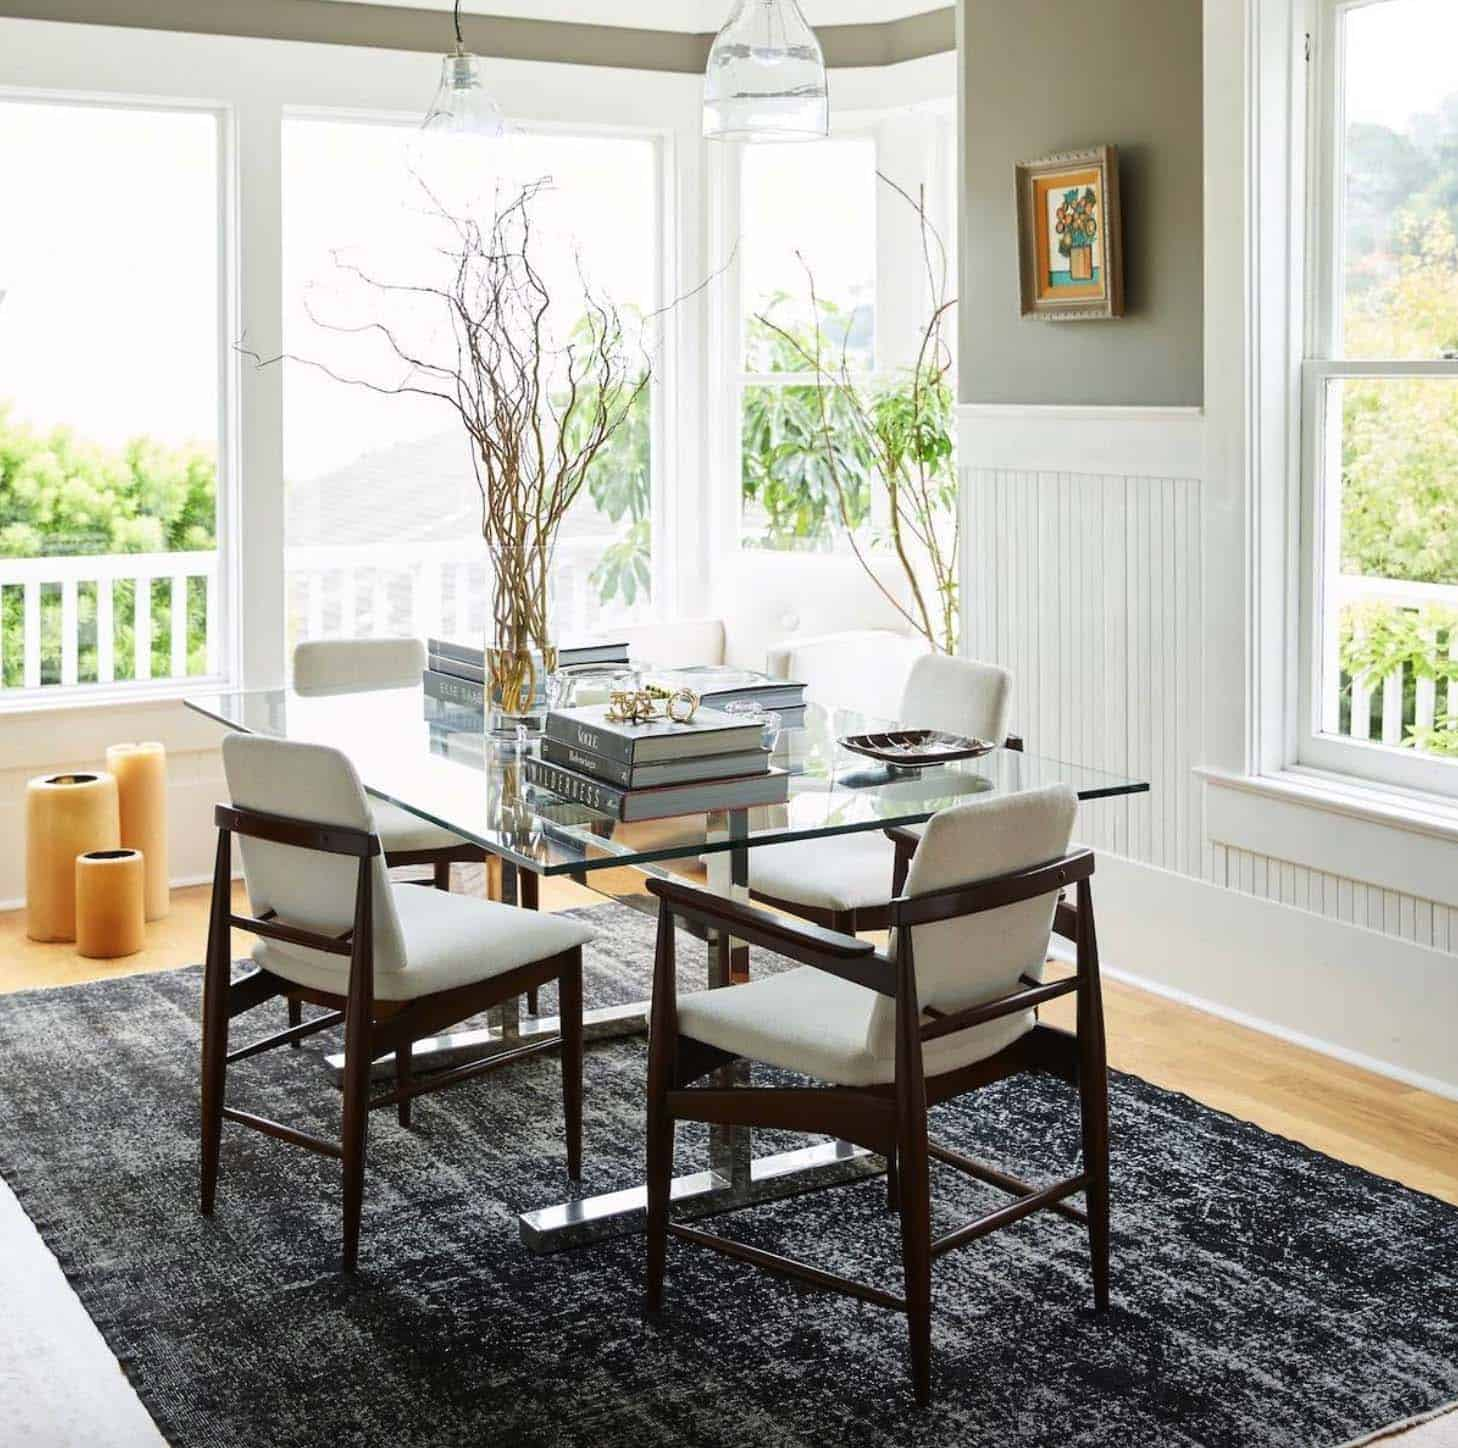 Transitional Style Home-Urrutia Design-02-1 Kindesign